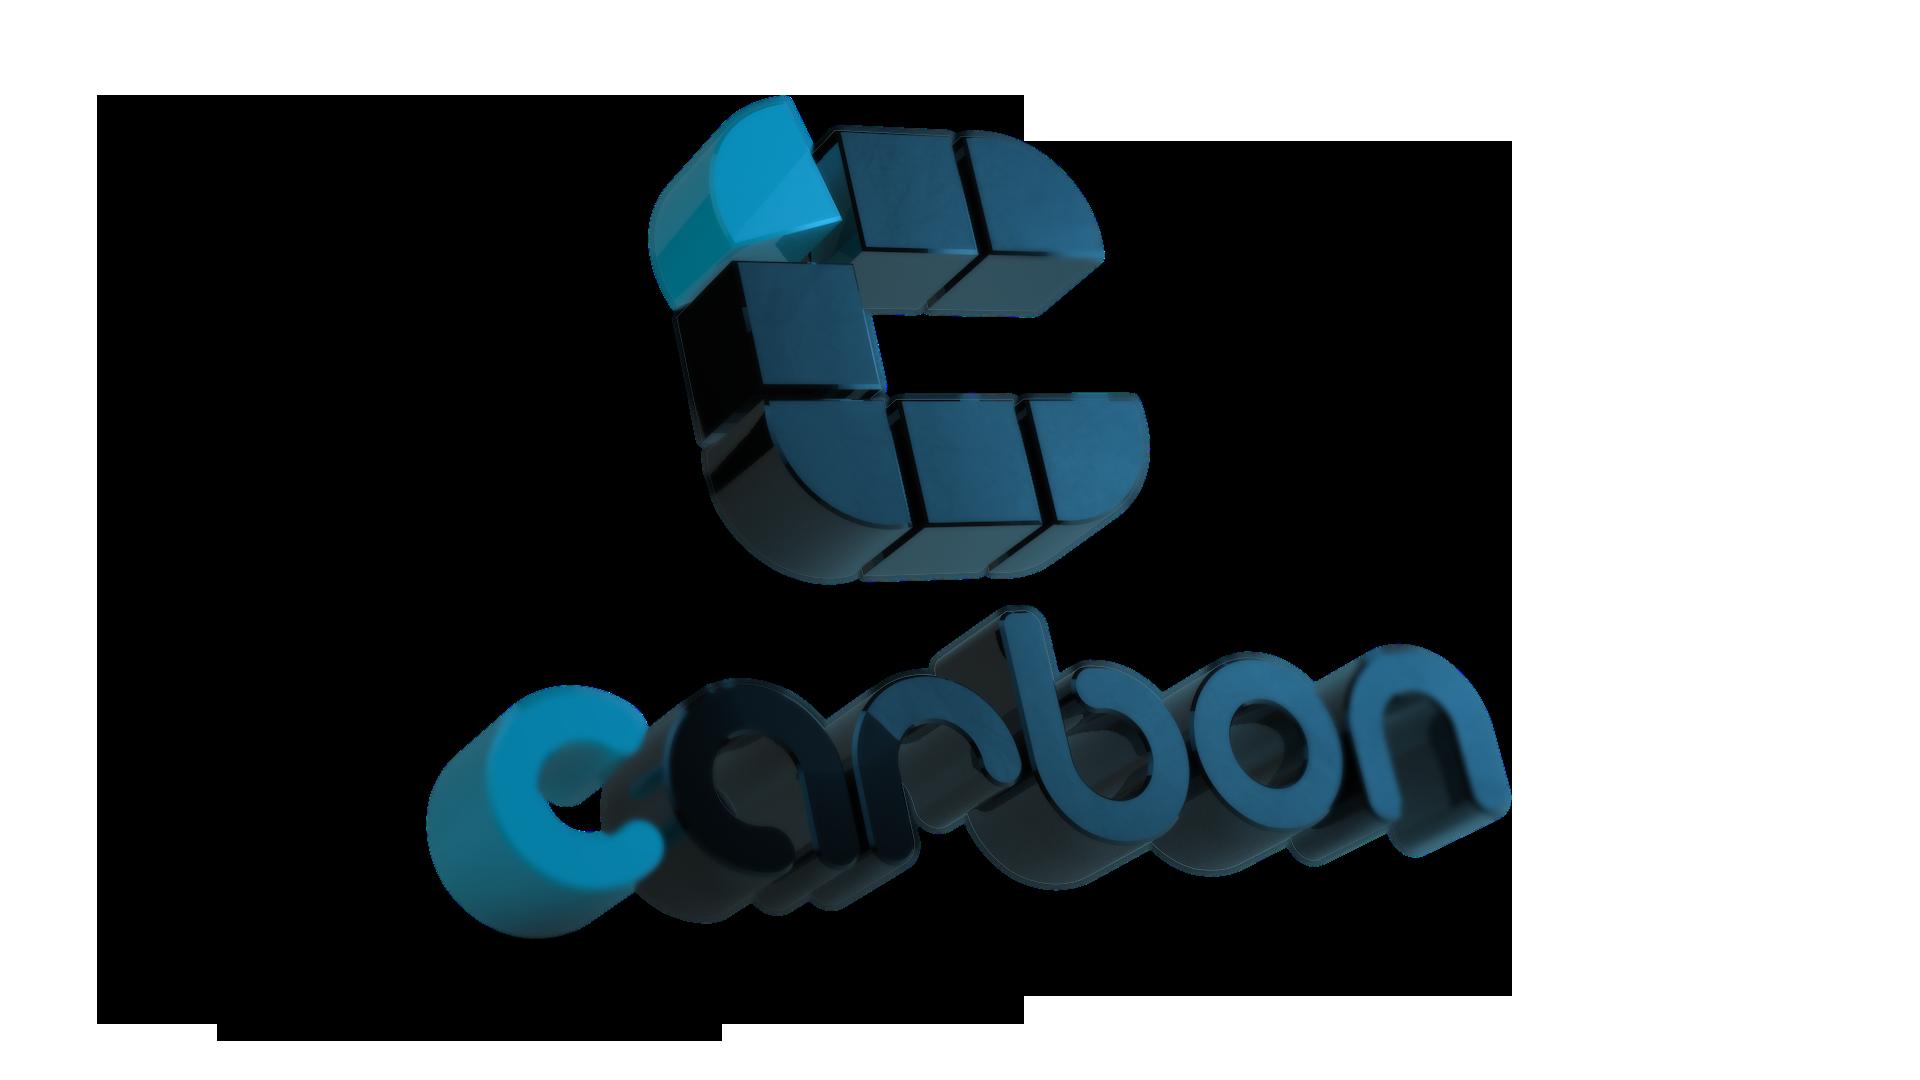 لوگو کربن - آژانس تبلیغاتی کربن -تبلیغات دیجیتال